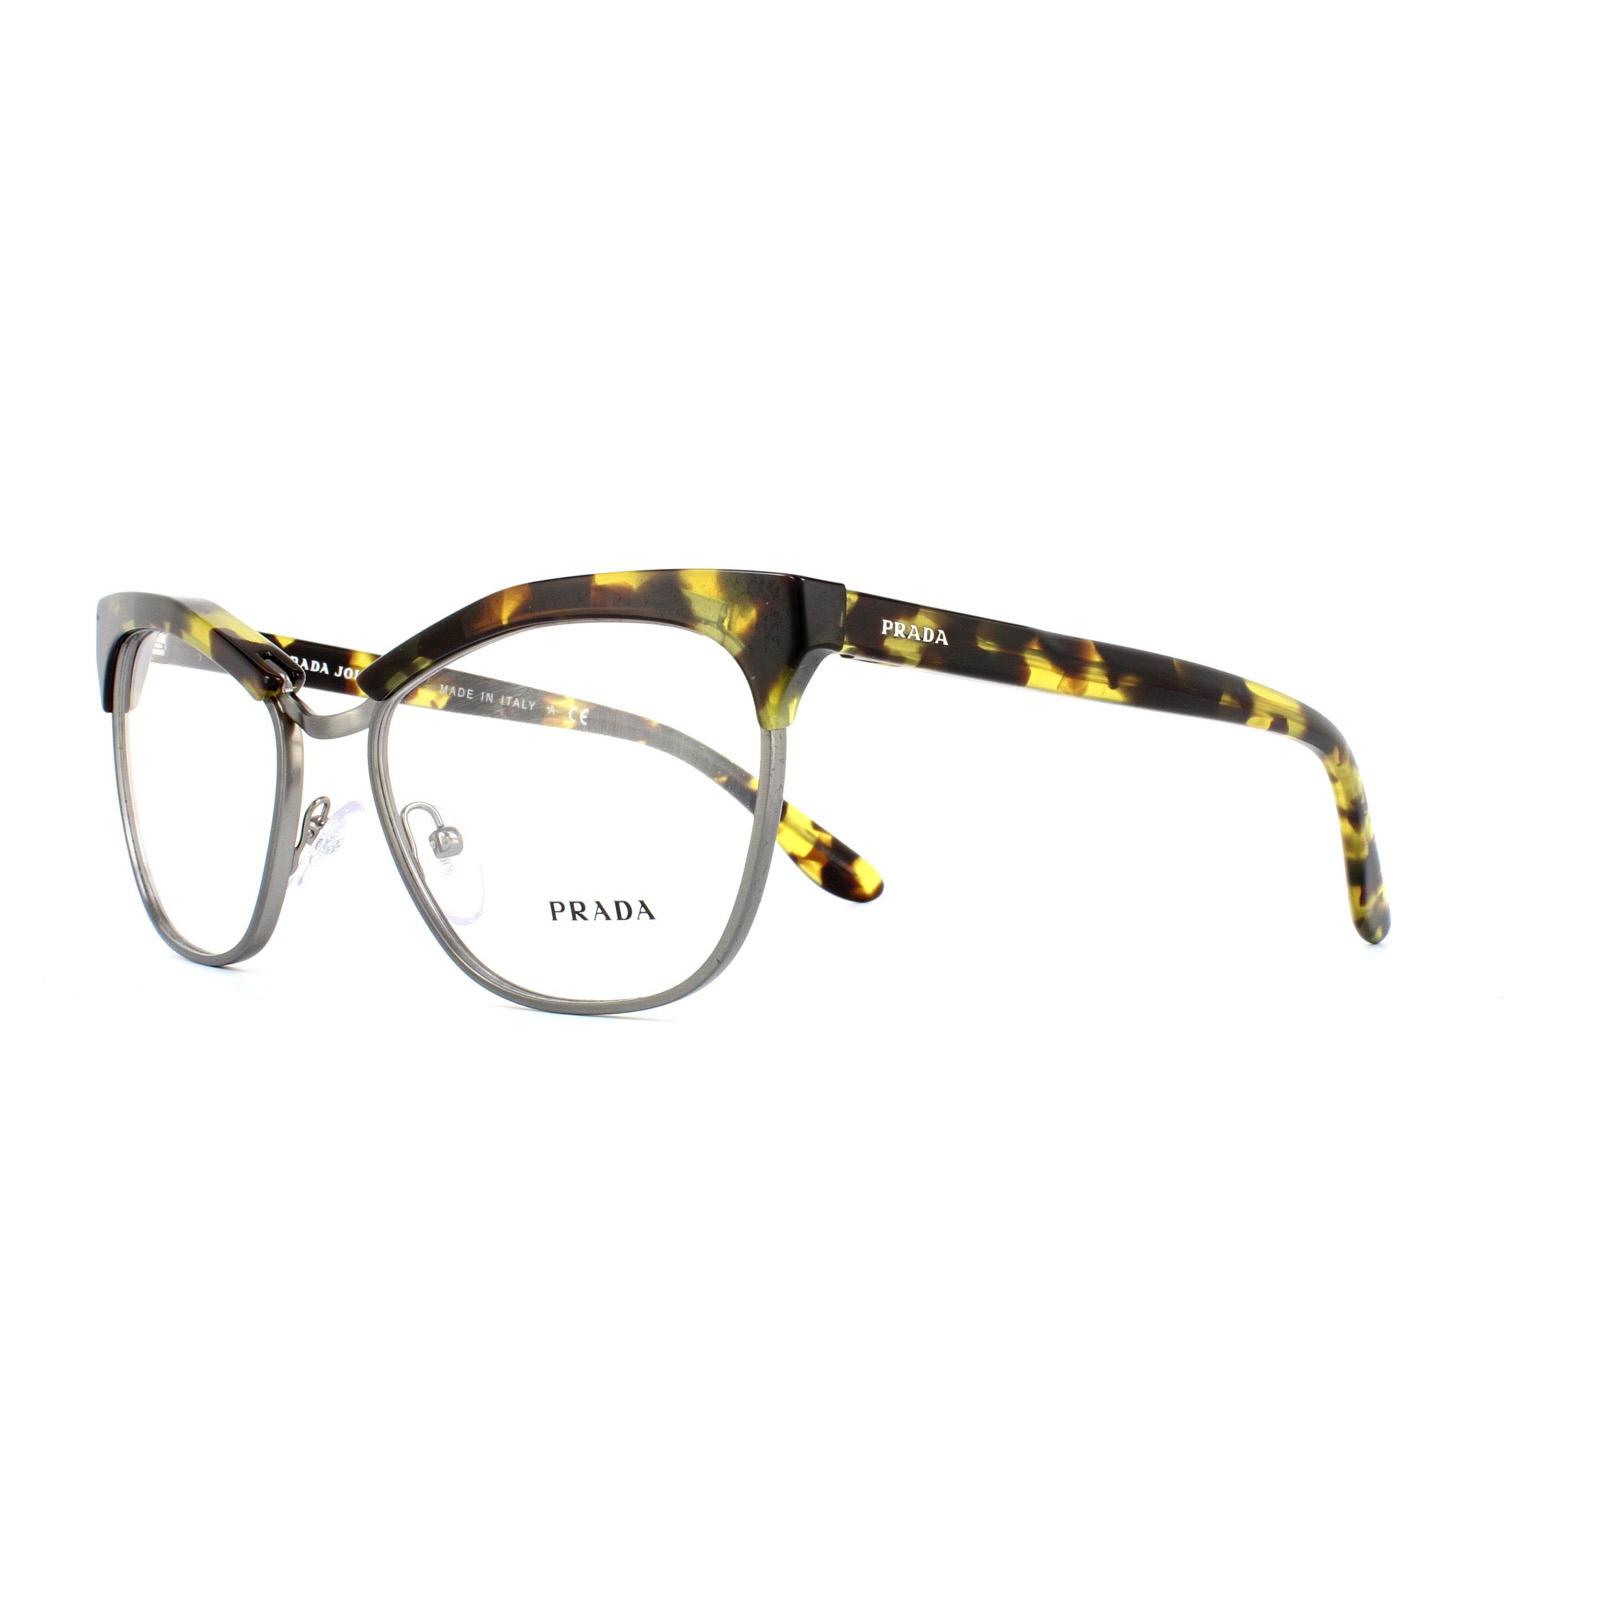 abacf20c213d5 Sentinel Prada Glasses Frames 14SV UBN1O1 Yellow Havana Womens 55mm